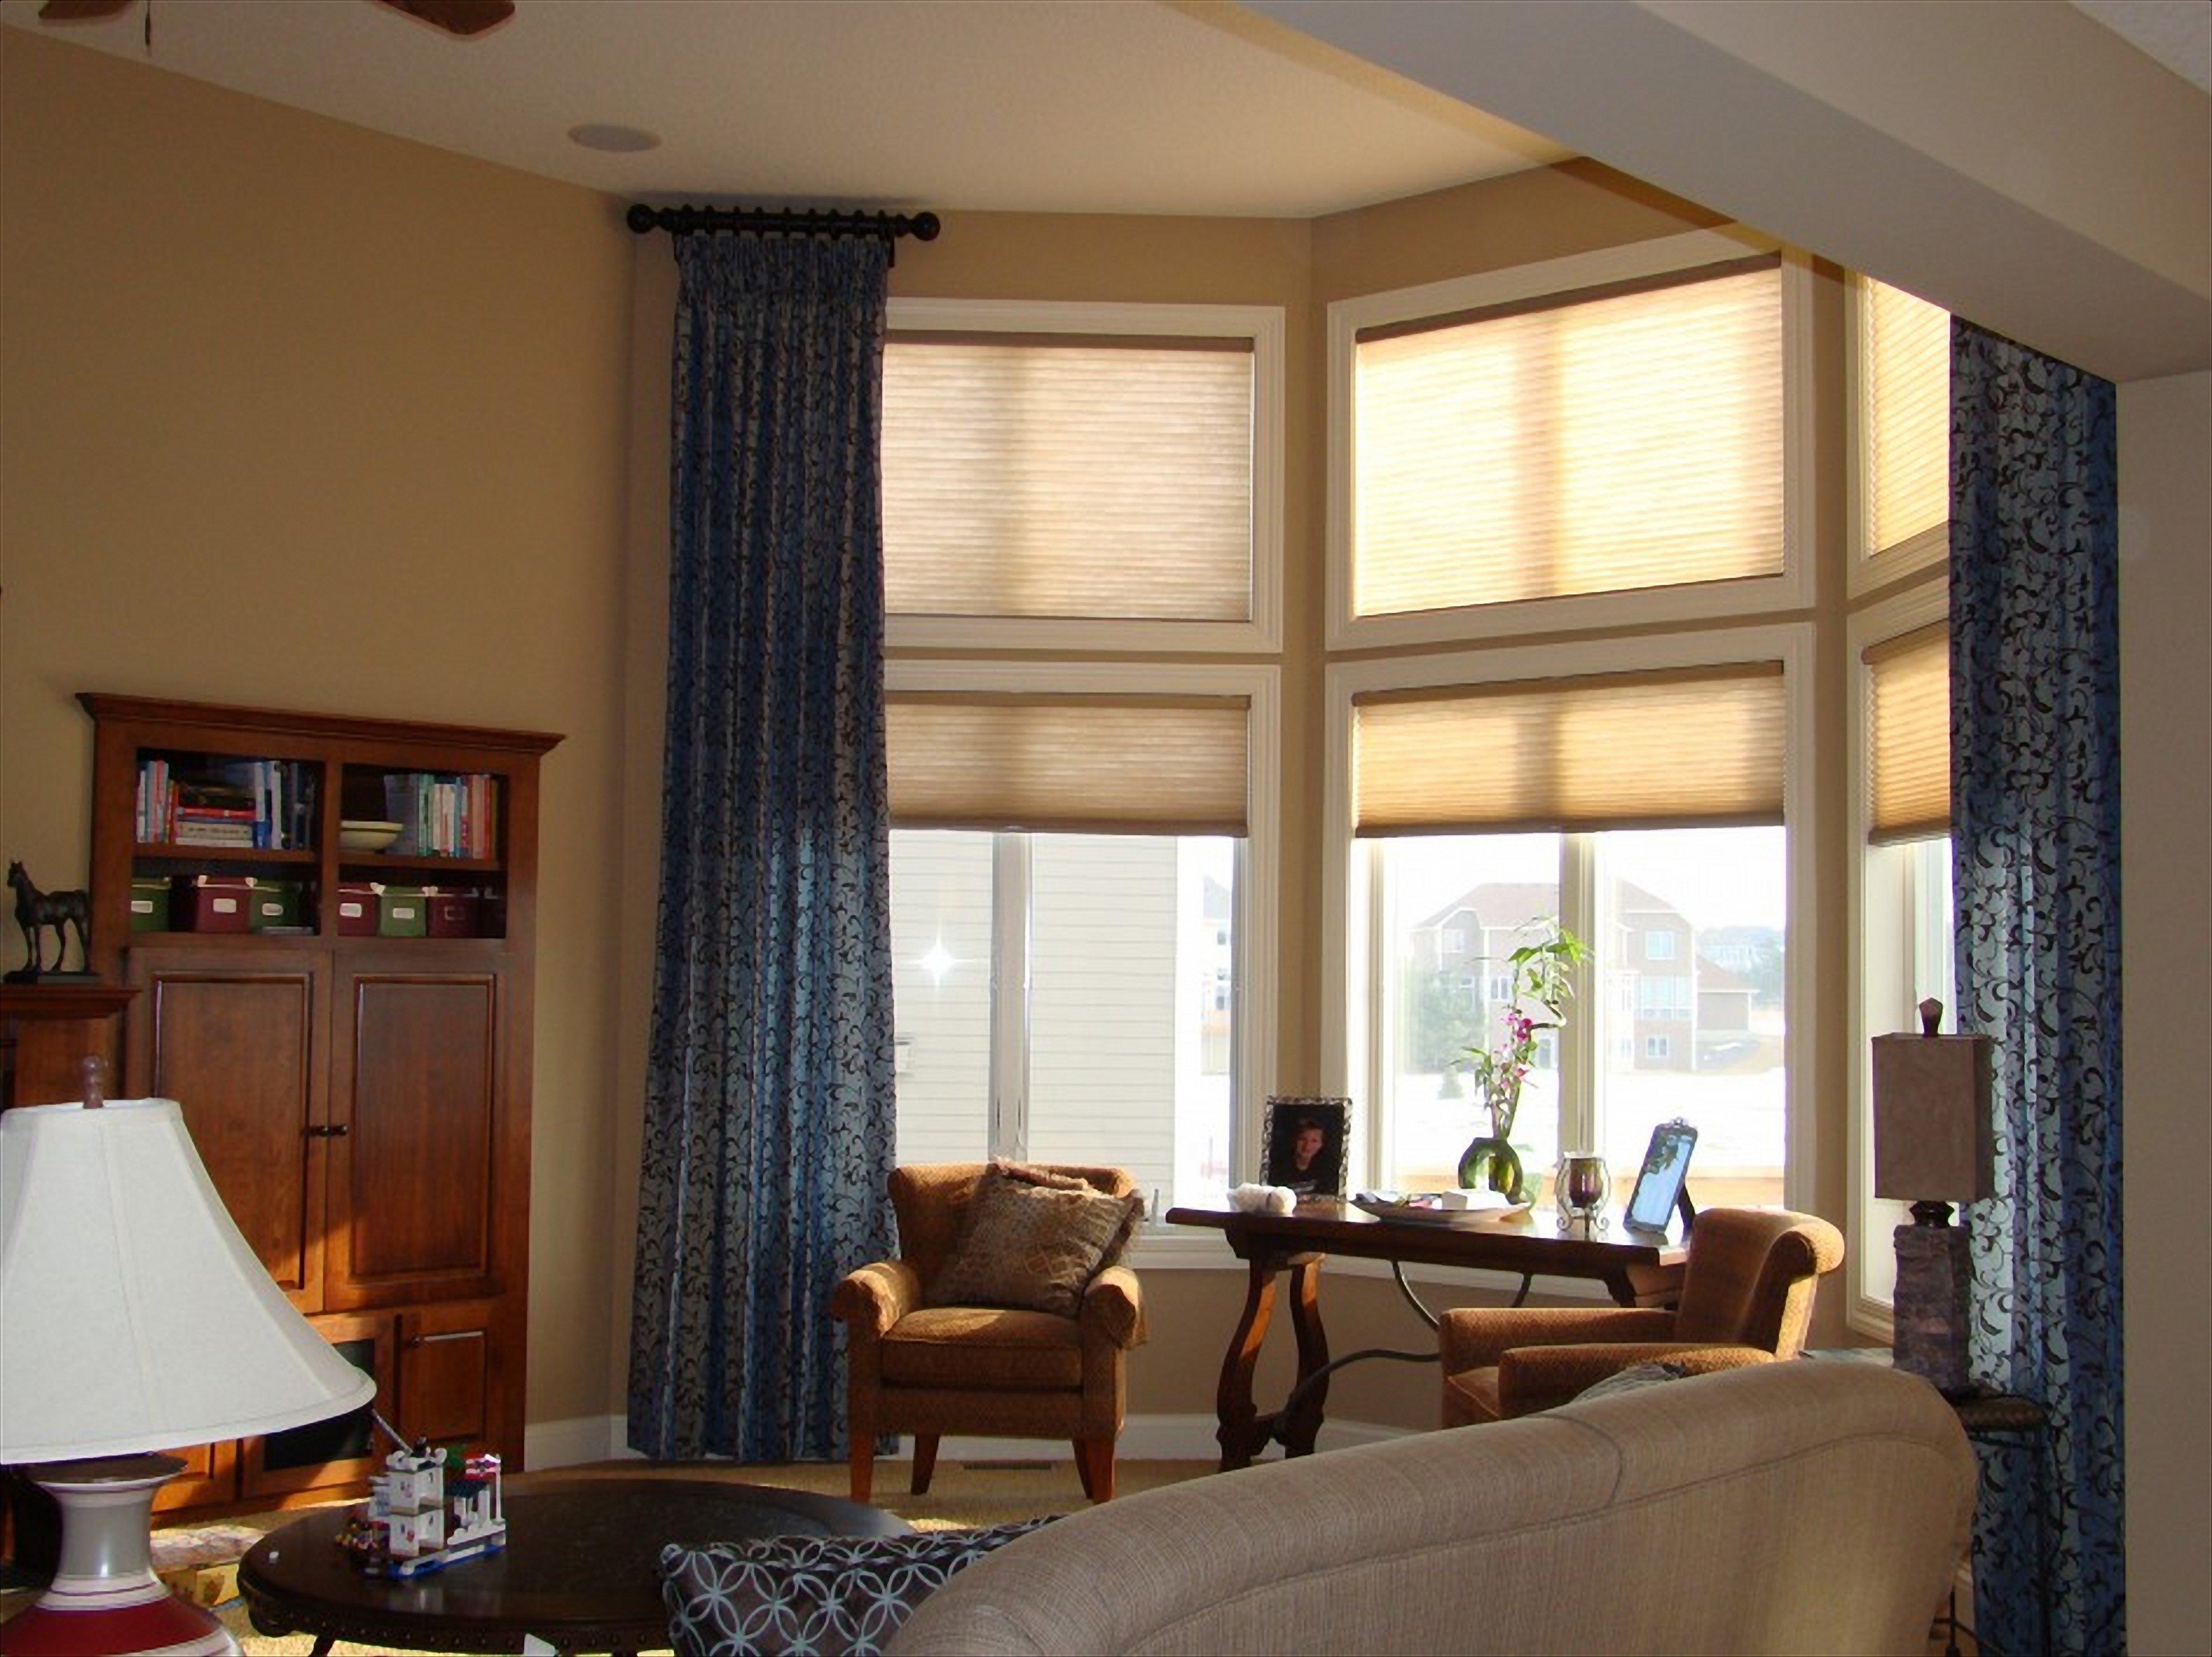 10 Famous Curtain Ideas For Large Windows fantastical curtain ideas for large windows or 3 picture bay rod 2020